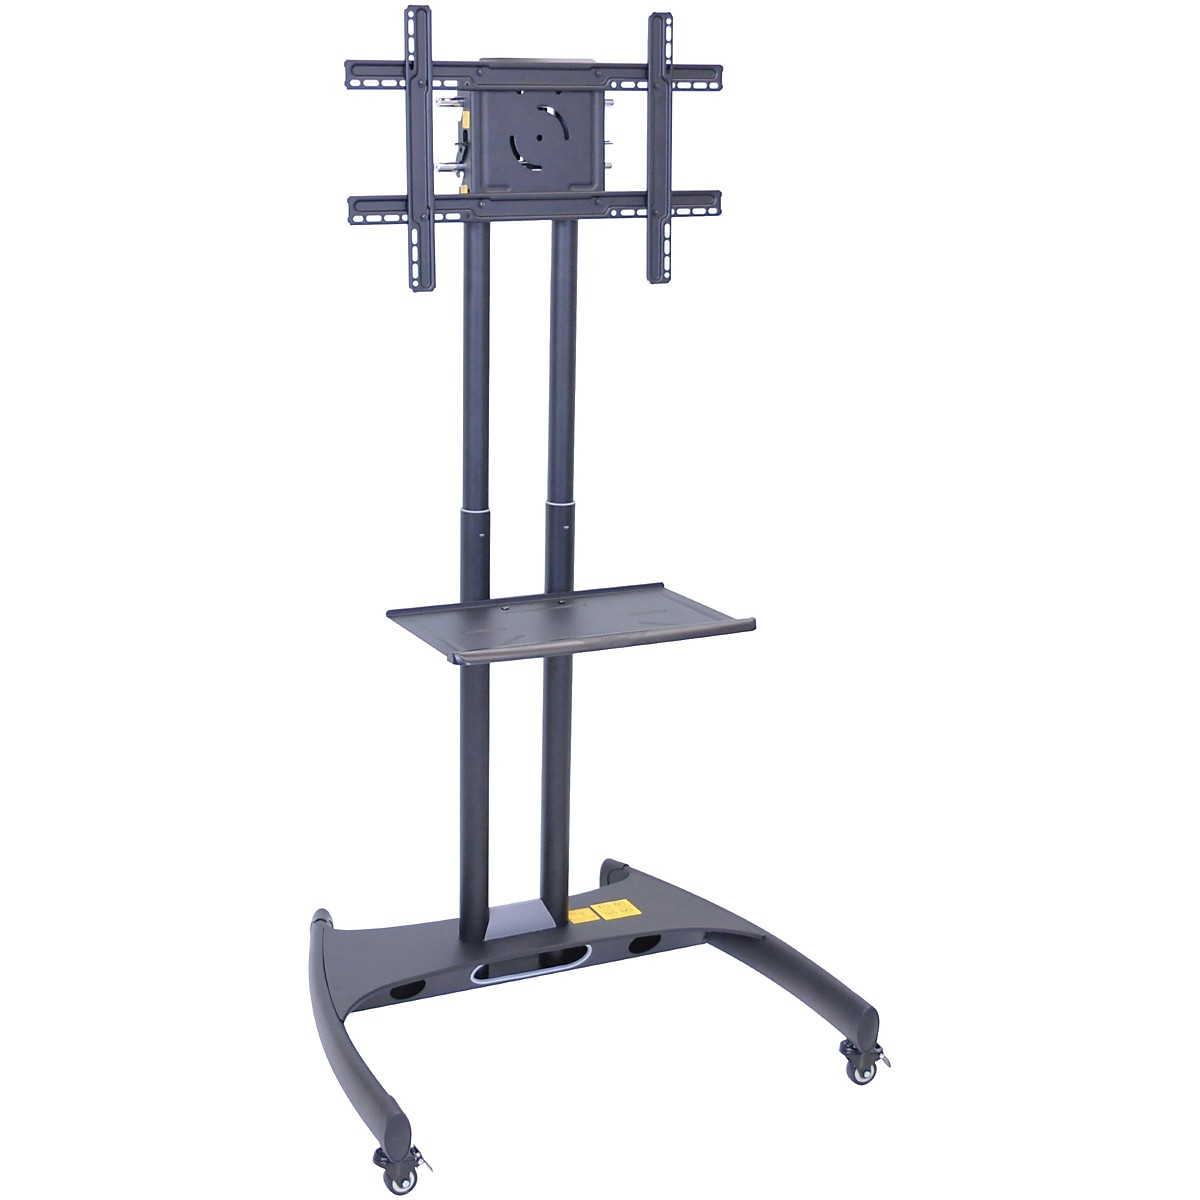 H. Wilson Luxor Adjustable Flat Panel Cart with Shelf